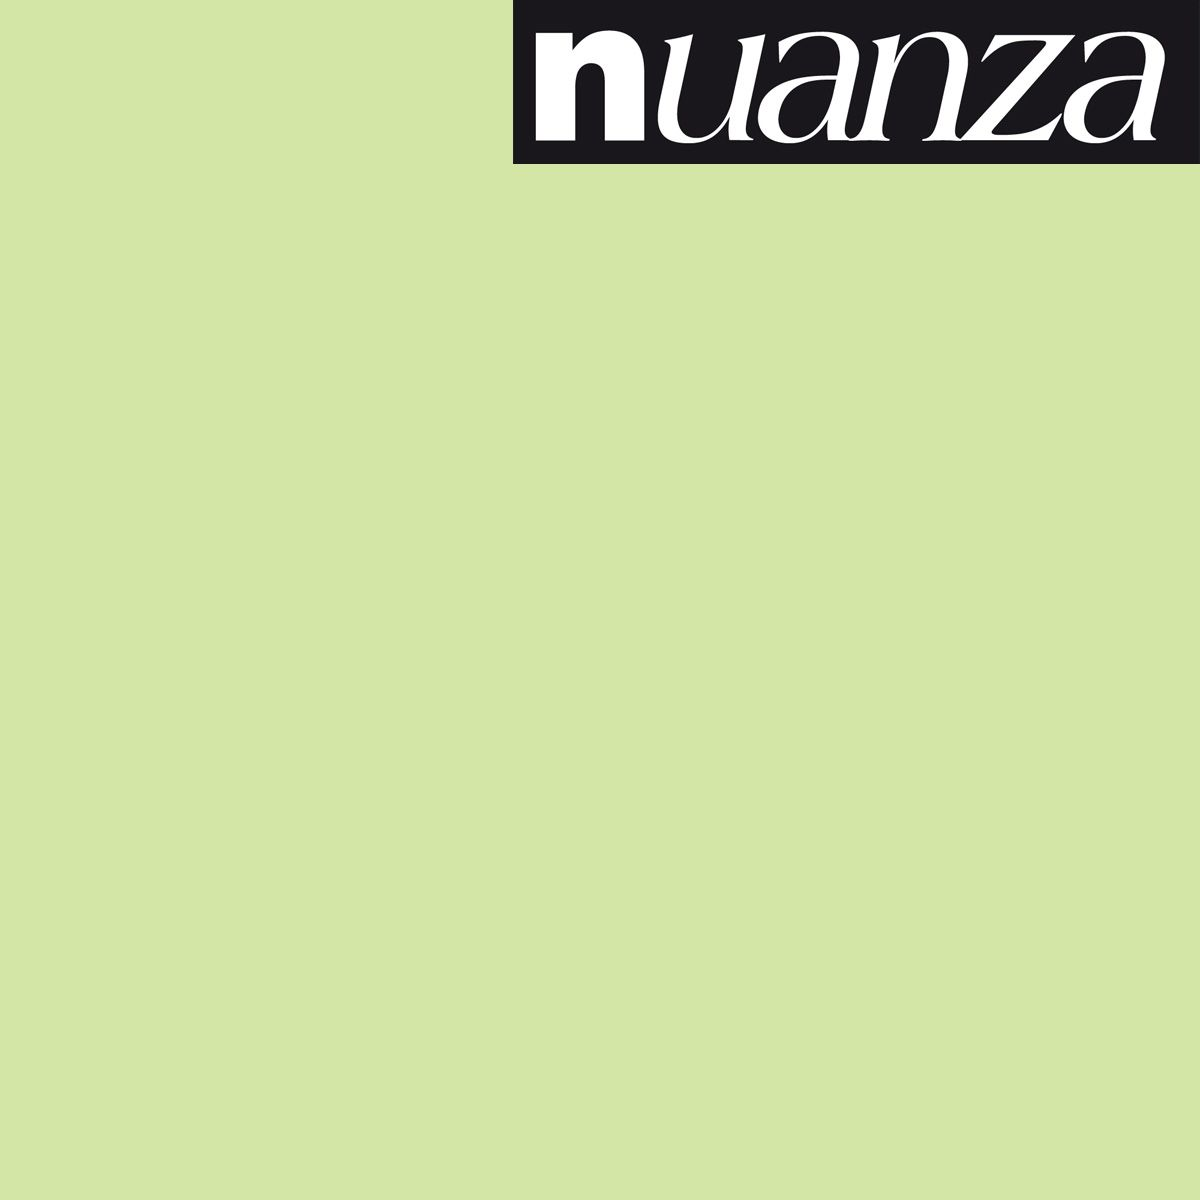 Peinture amandine satin multisupports Nuanza 0.5l